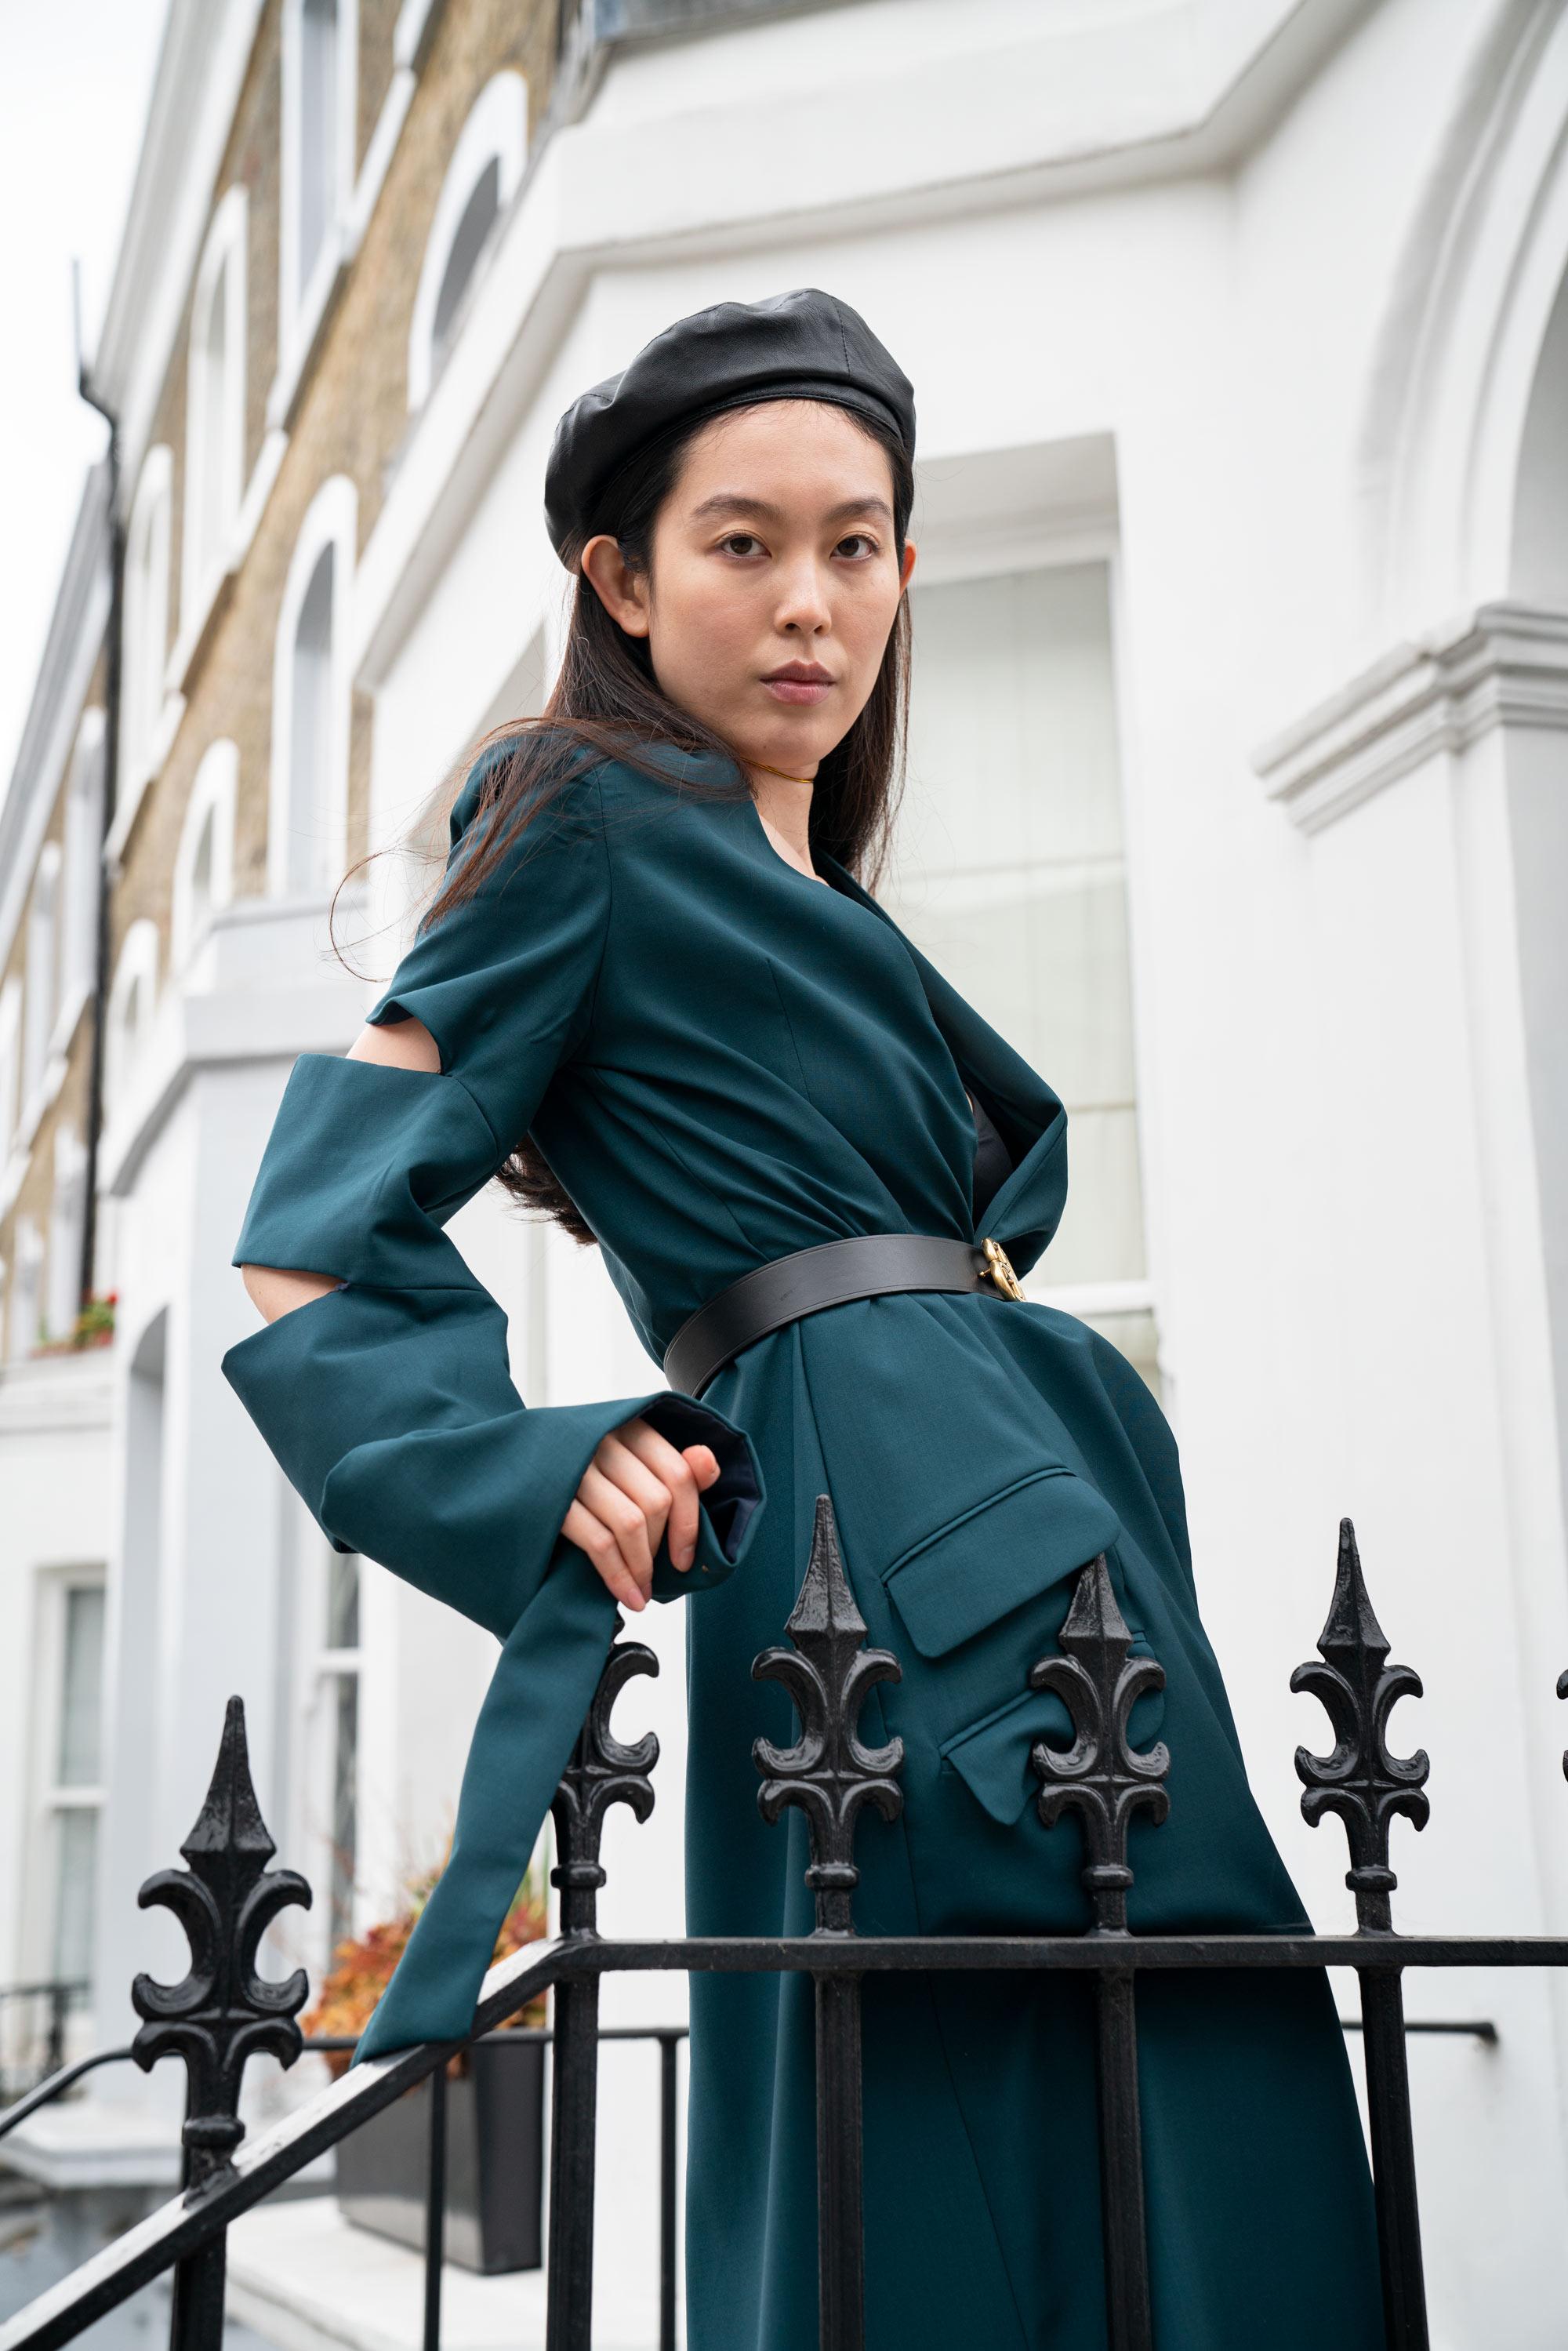 Model Crush Monday with Yixin Jenny Zhang